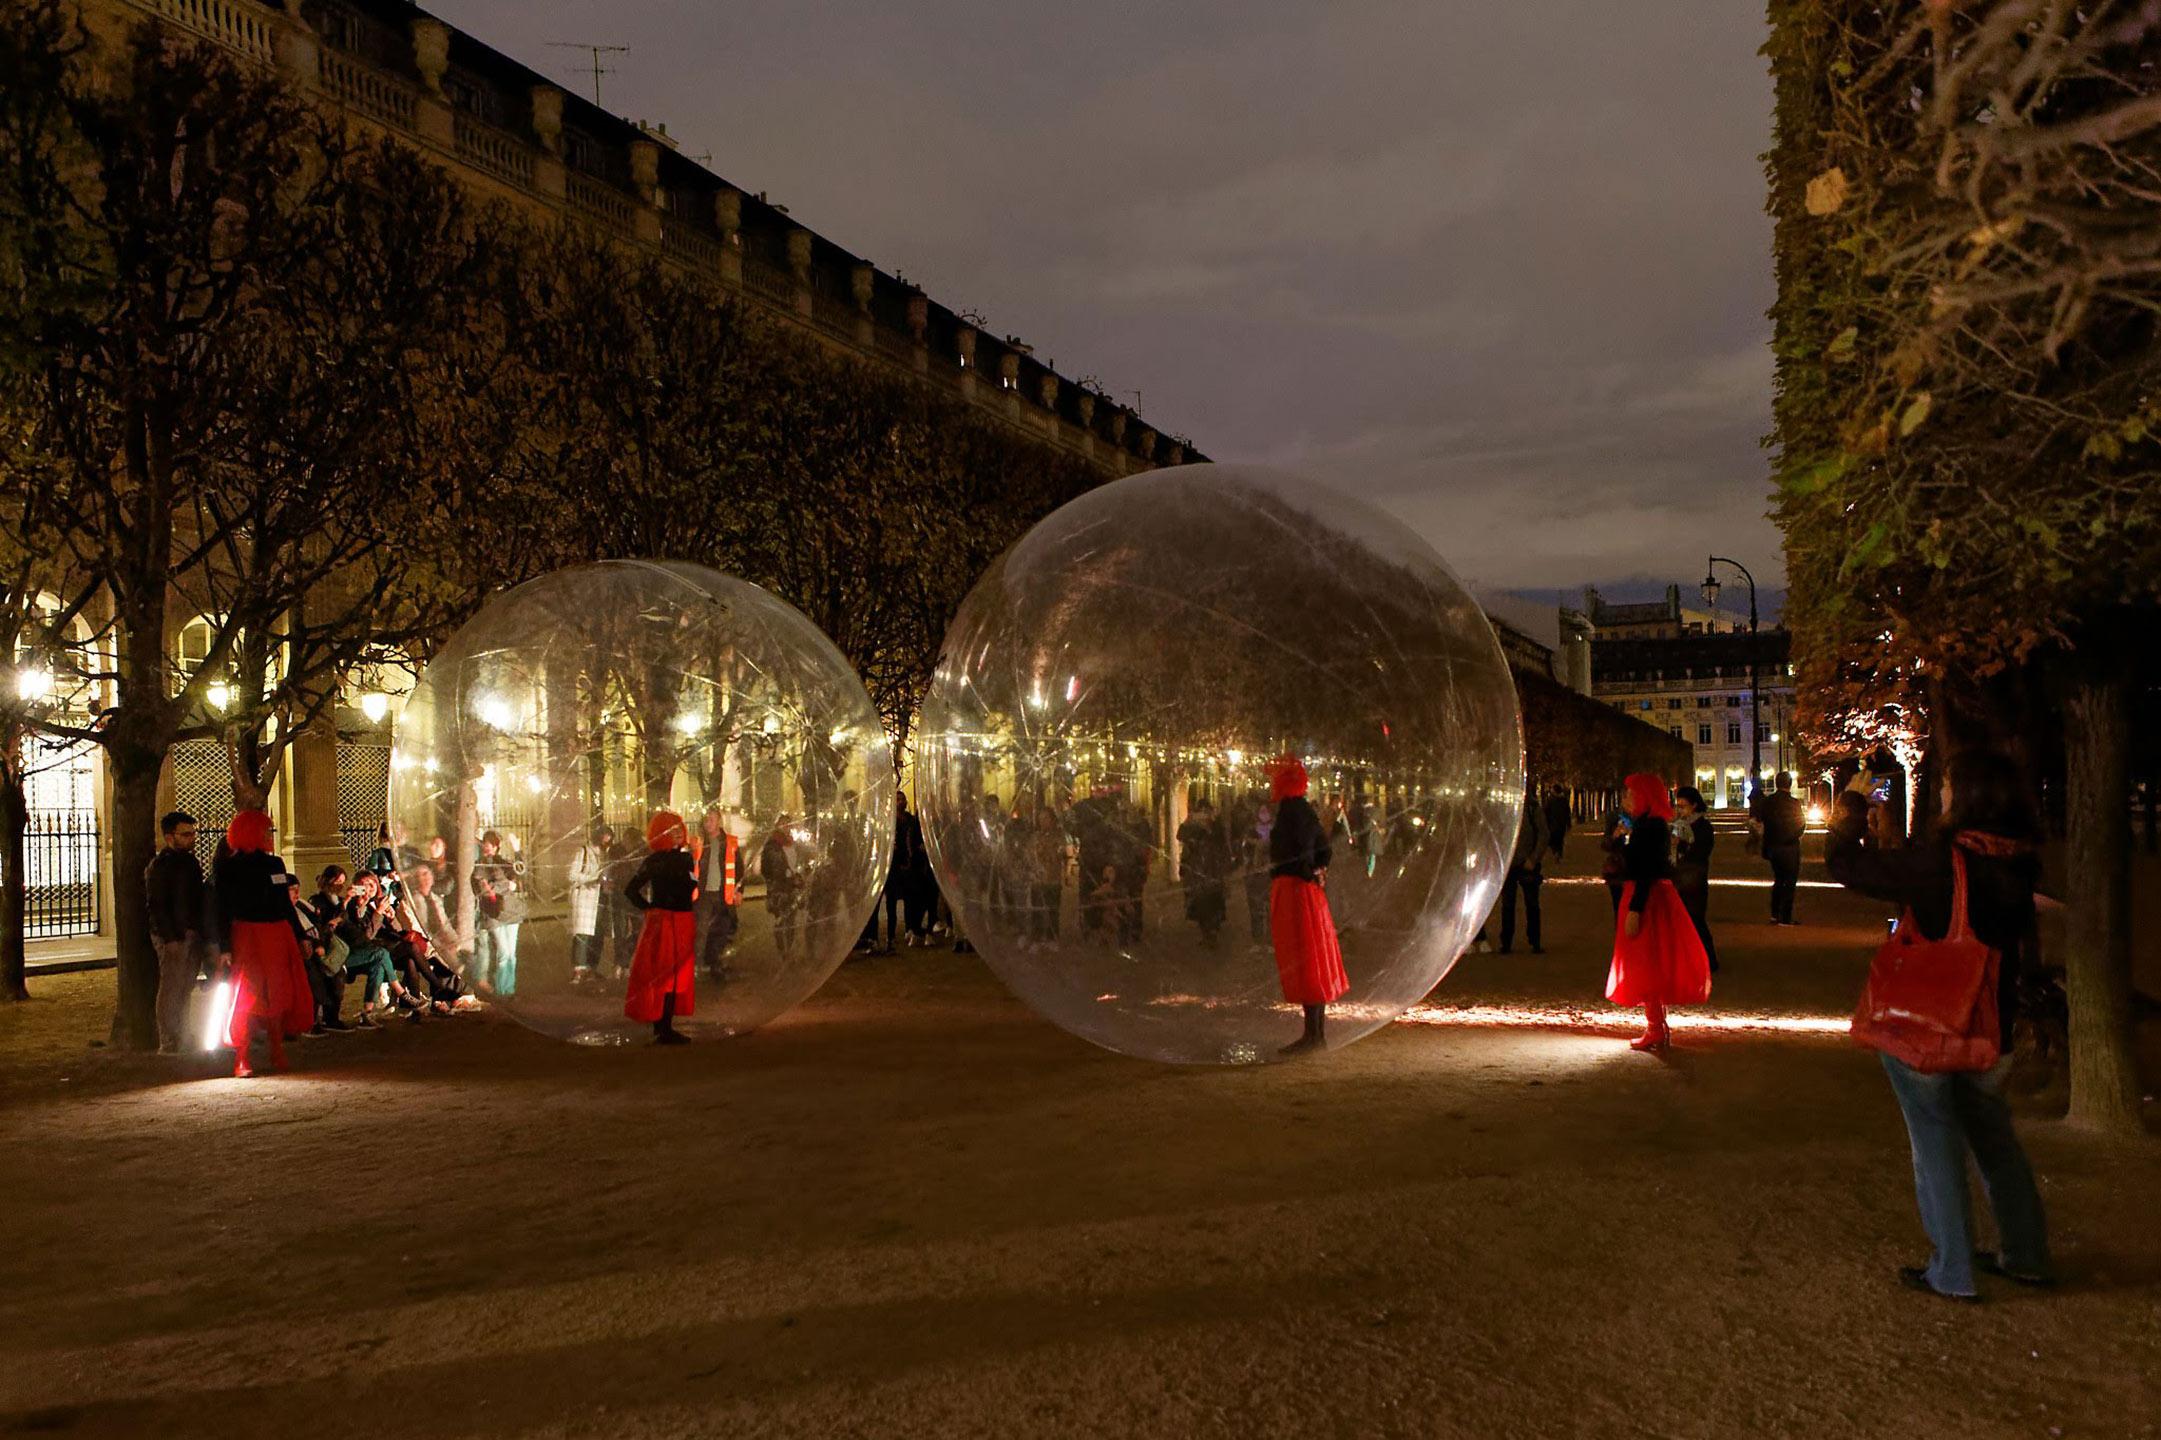 eva-albarran-Hans-Walter-Muller-Spheres-Nuit-Blanche-2019-Ville-de-Paris